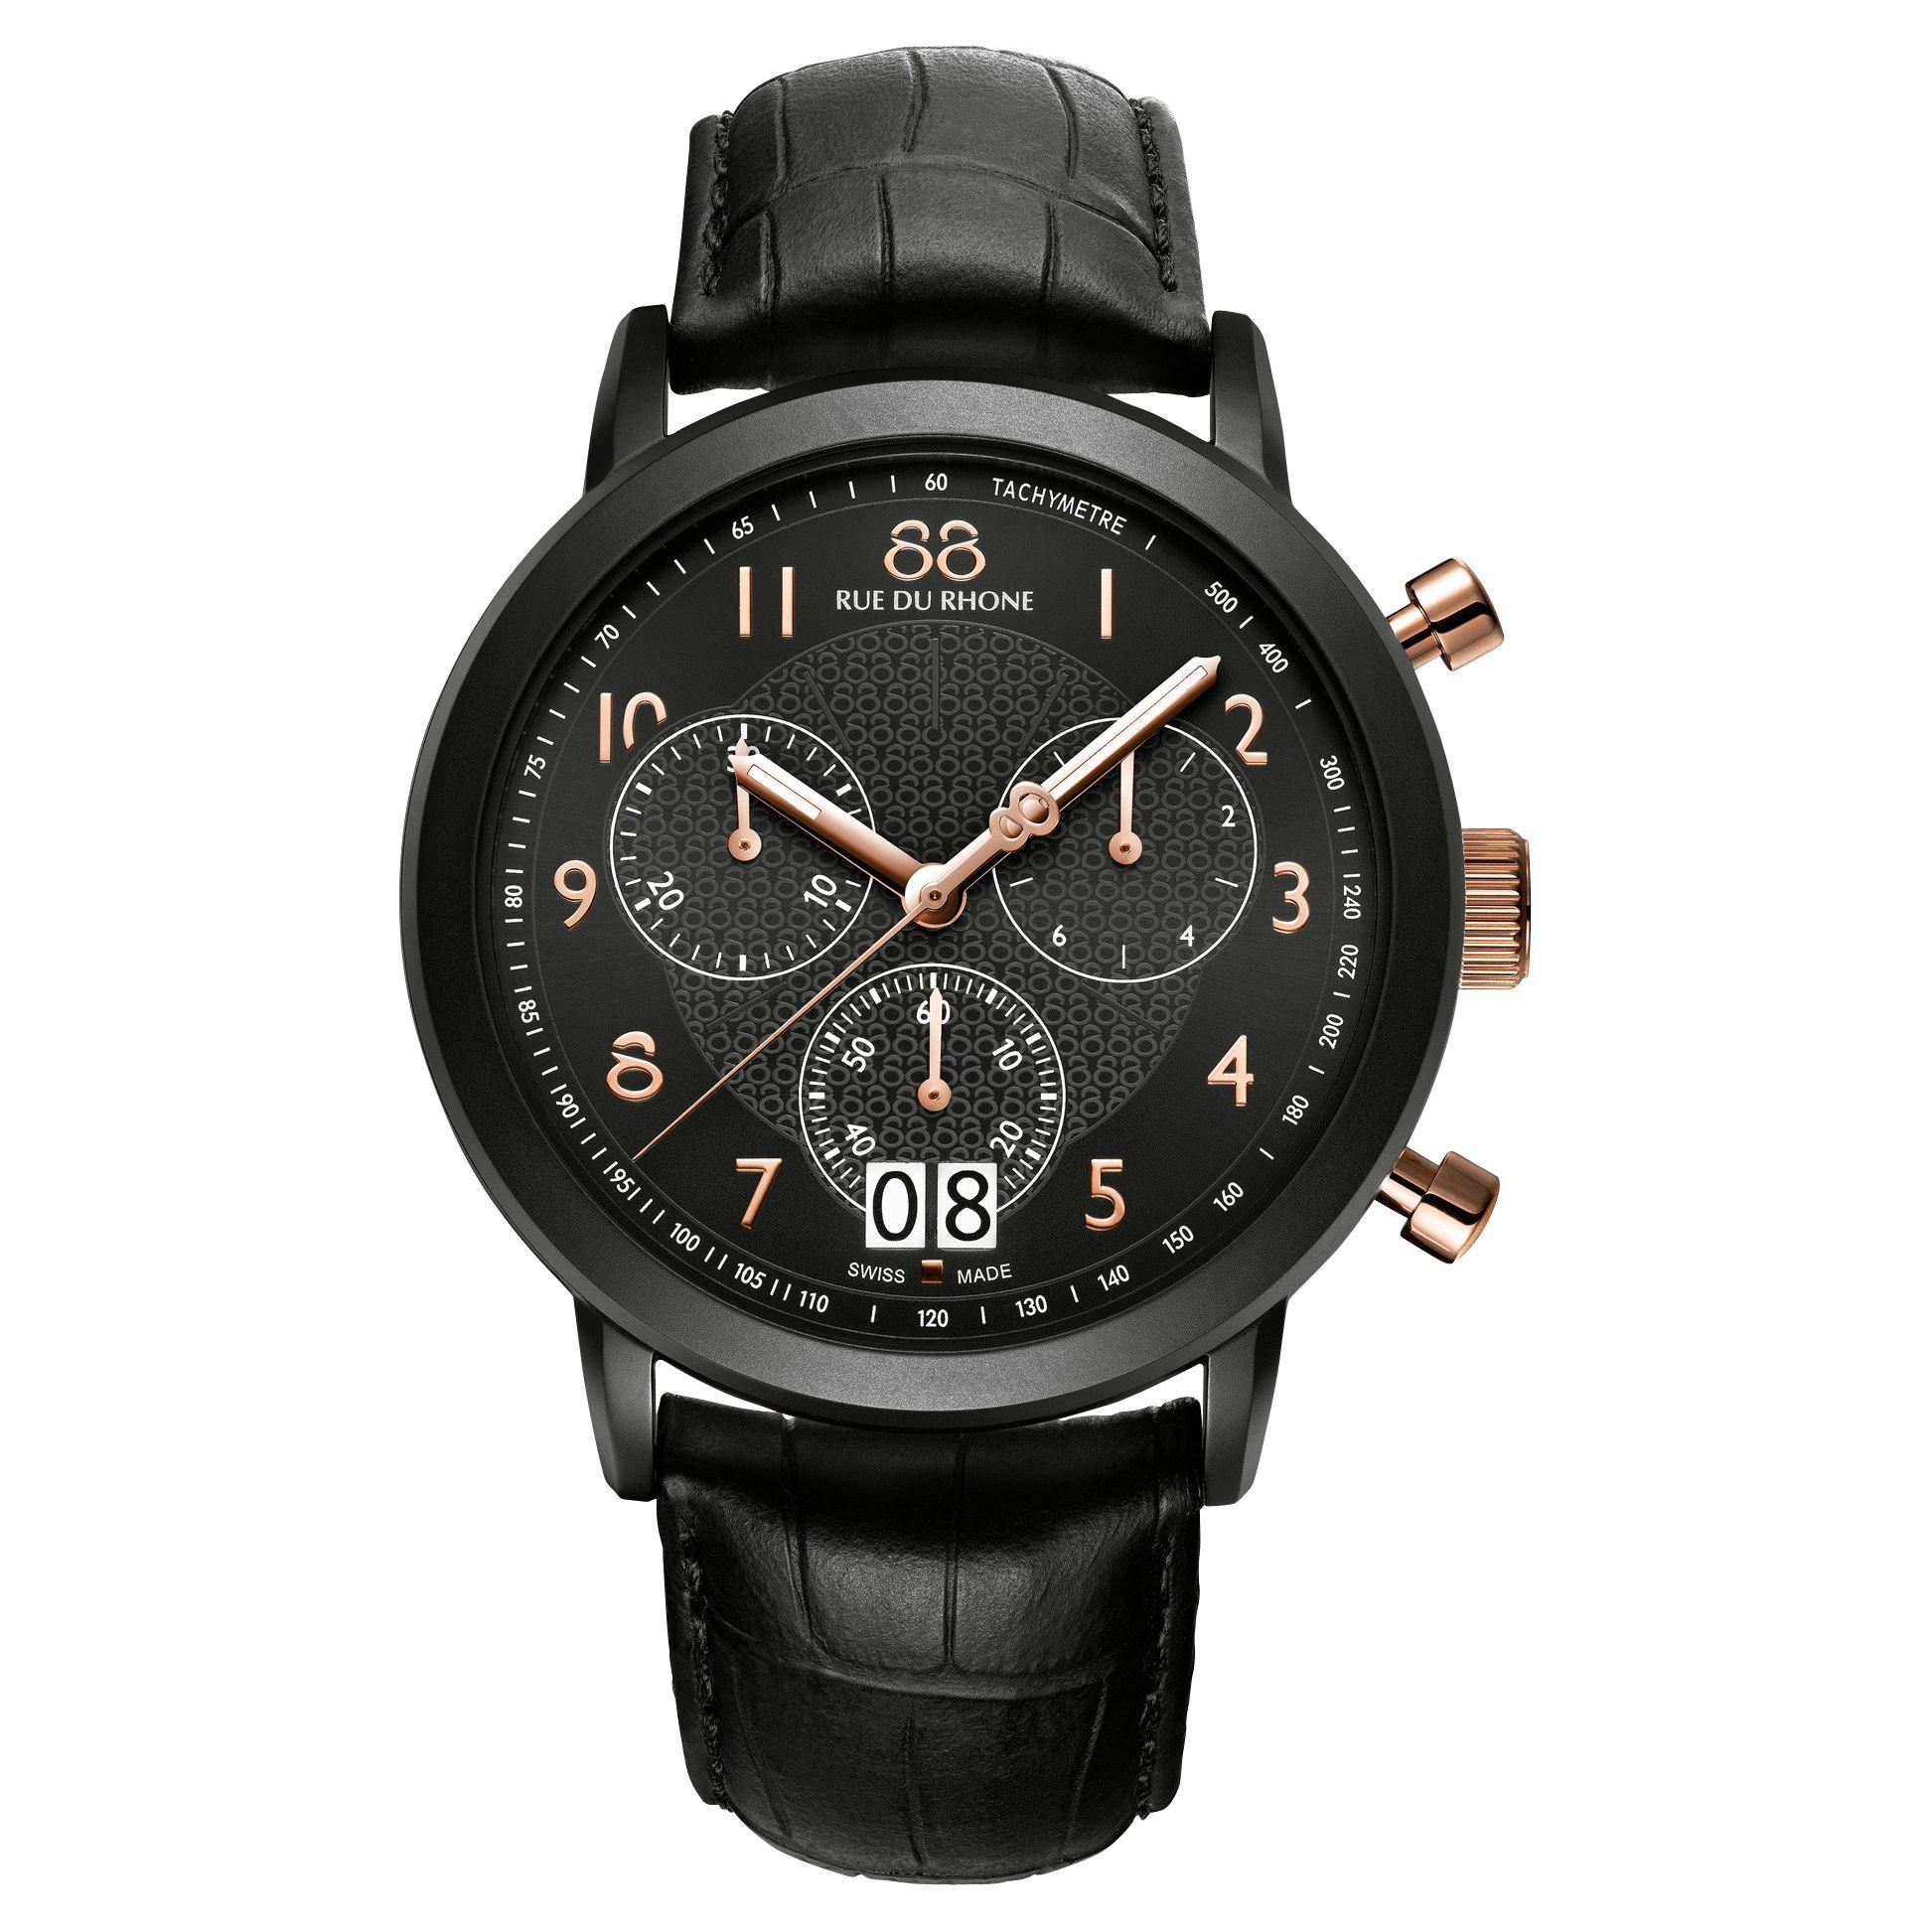 88 Rue Du Rhone 88 Rue Du Rhone 87WA130023 Double 8 Origin Men's Chronograph Leather Strap Watch, Black